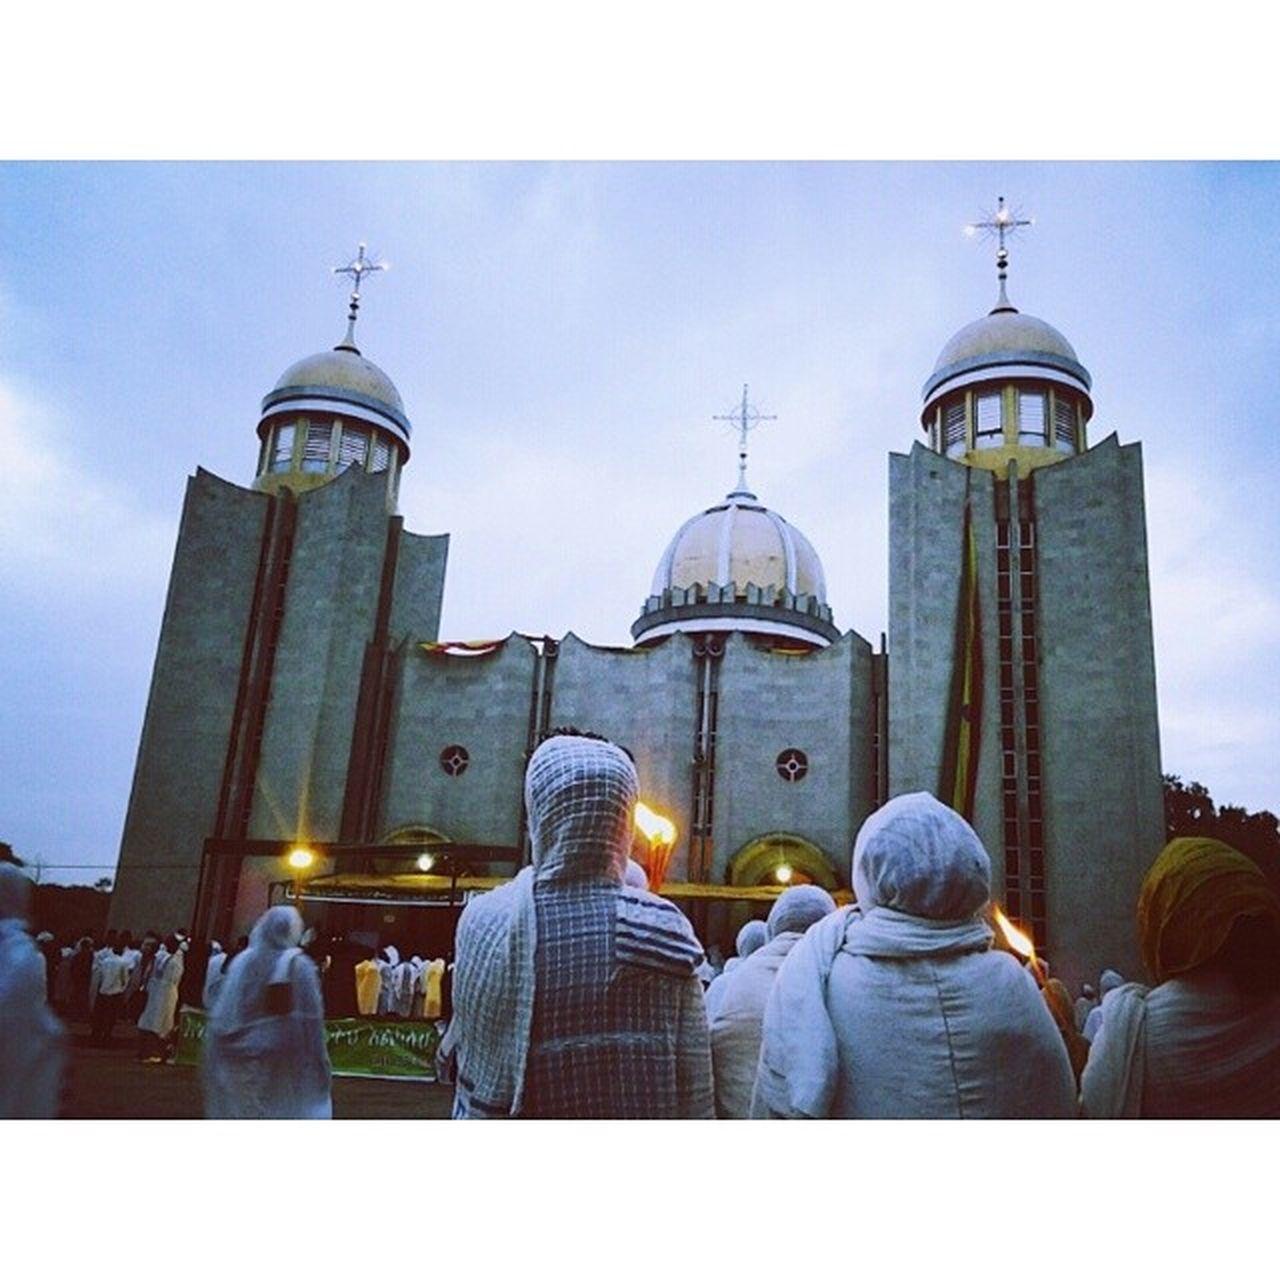 Picoftheday Hawassa Gebreil Monastery EthiopianOrthodox Ethiopia Africa